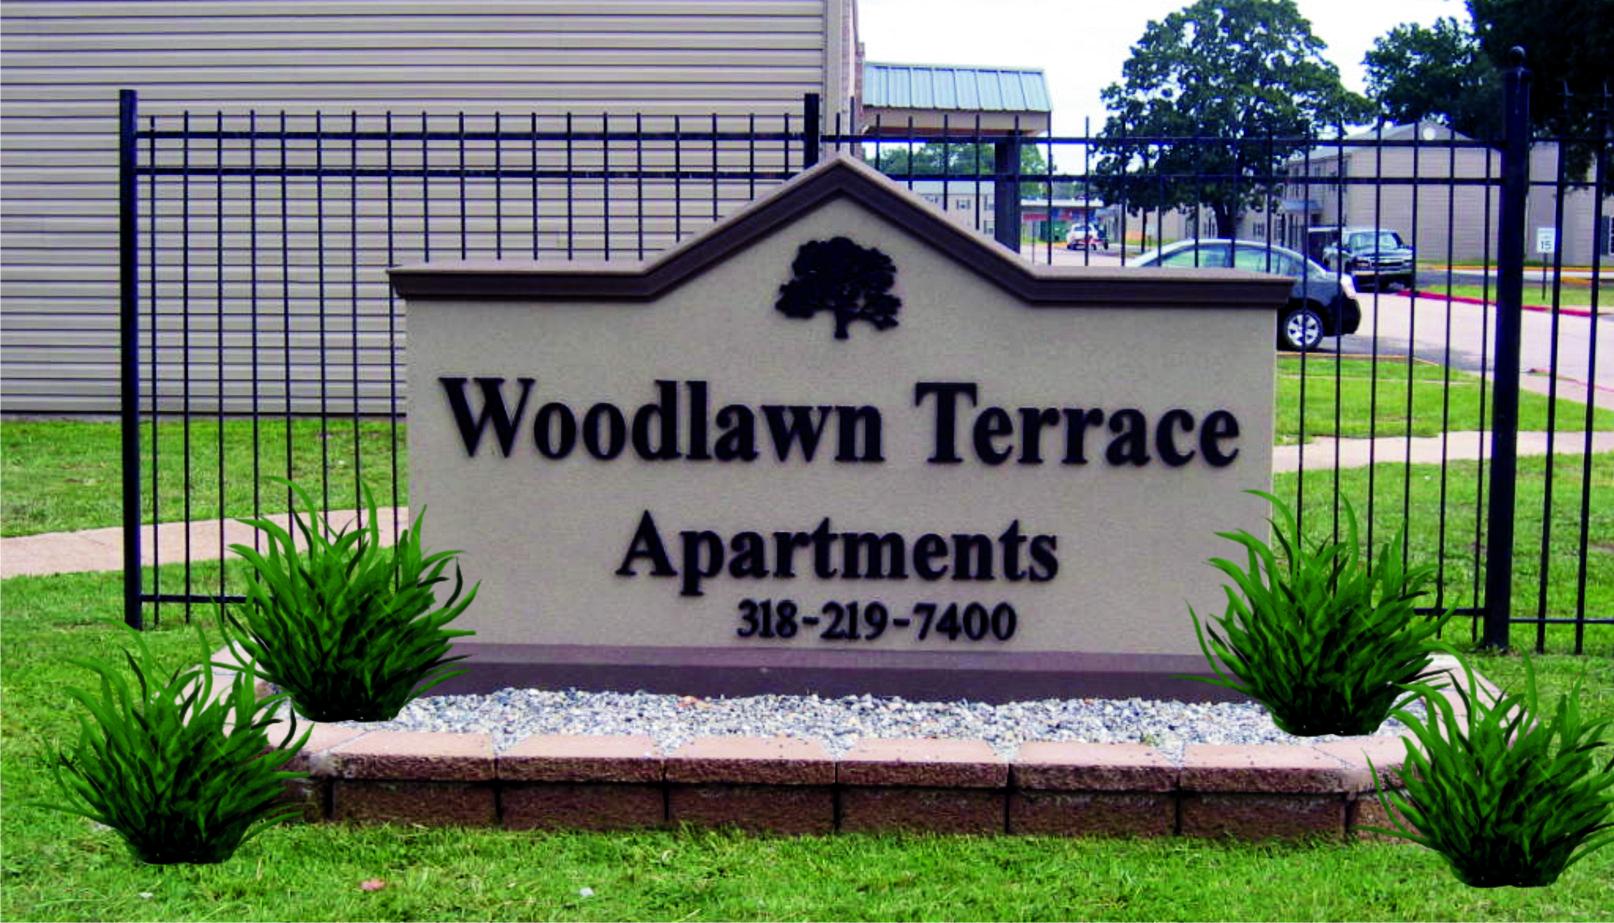 Woodlawn_Terrace.JPG